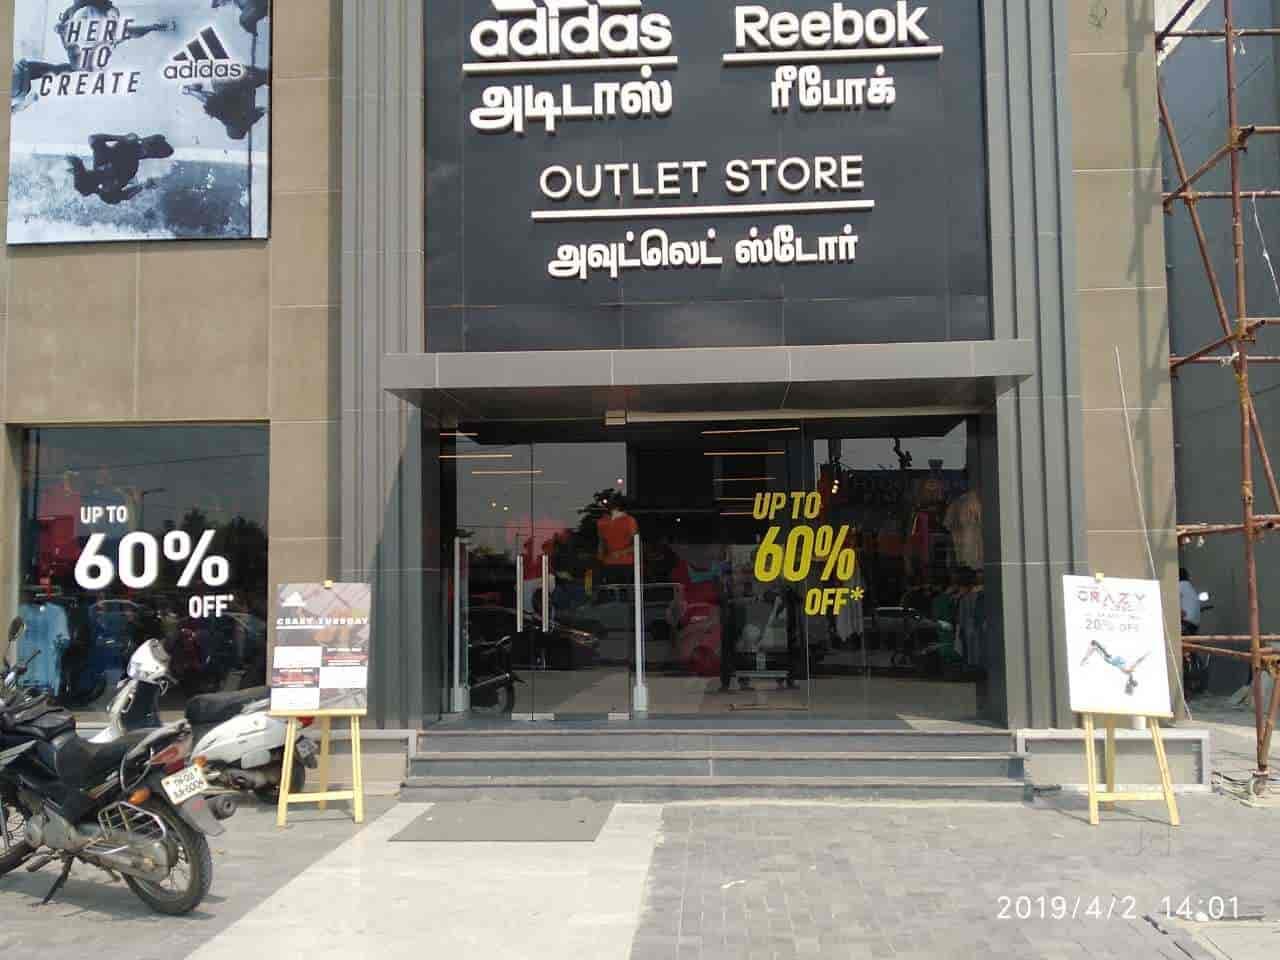 Adidas \u0026 Reebok Outlet, Okkiyam